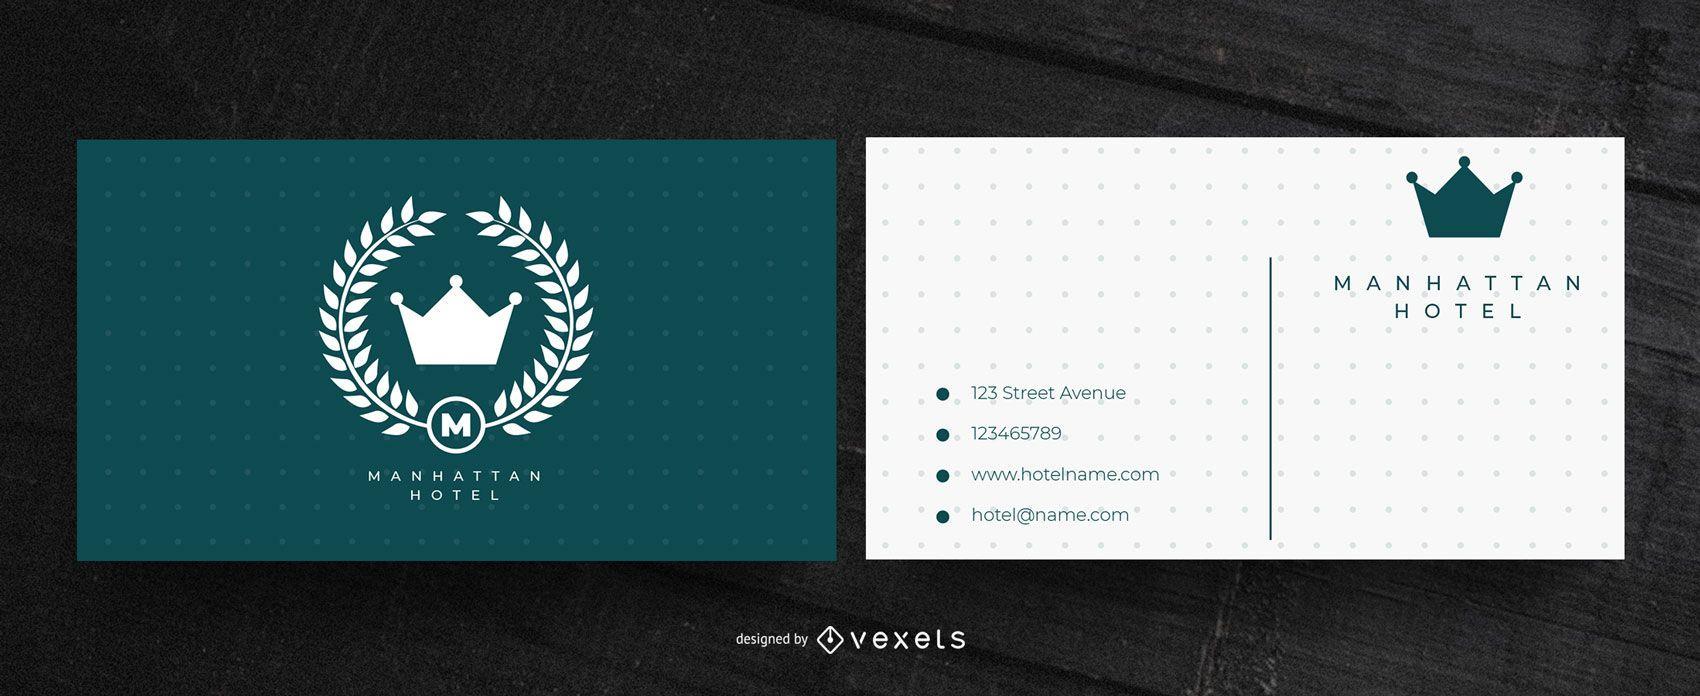 Hotel business card design